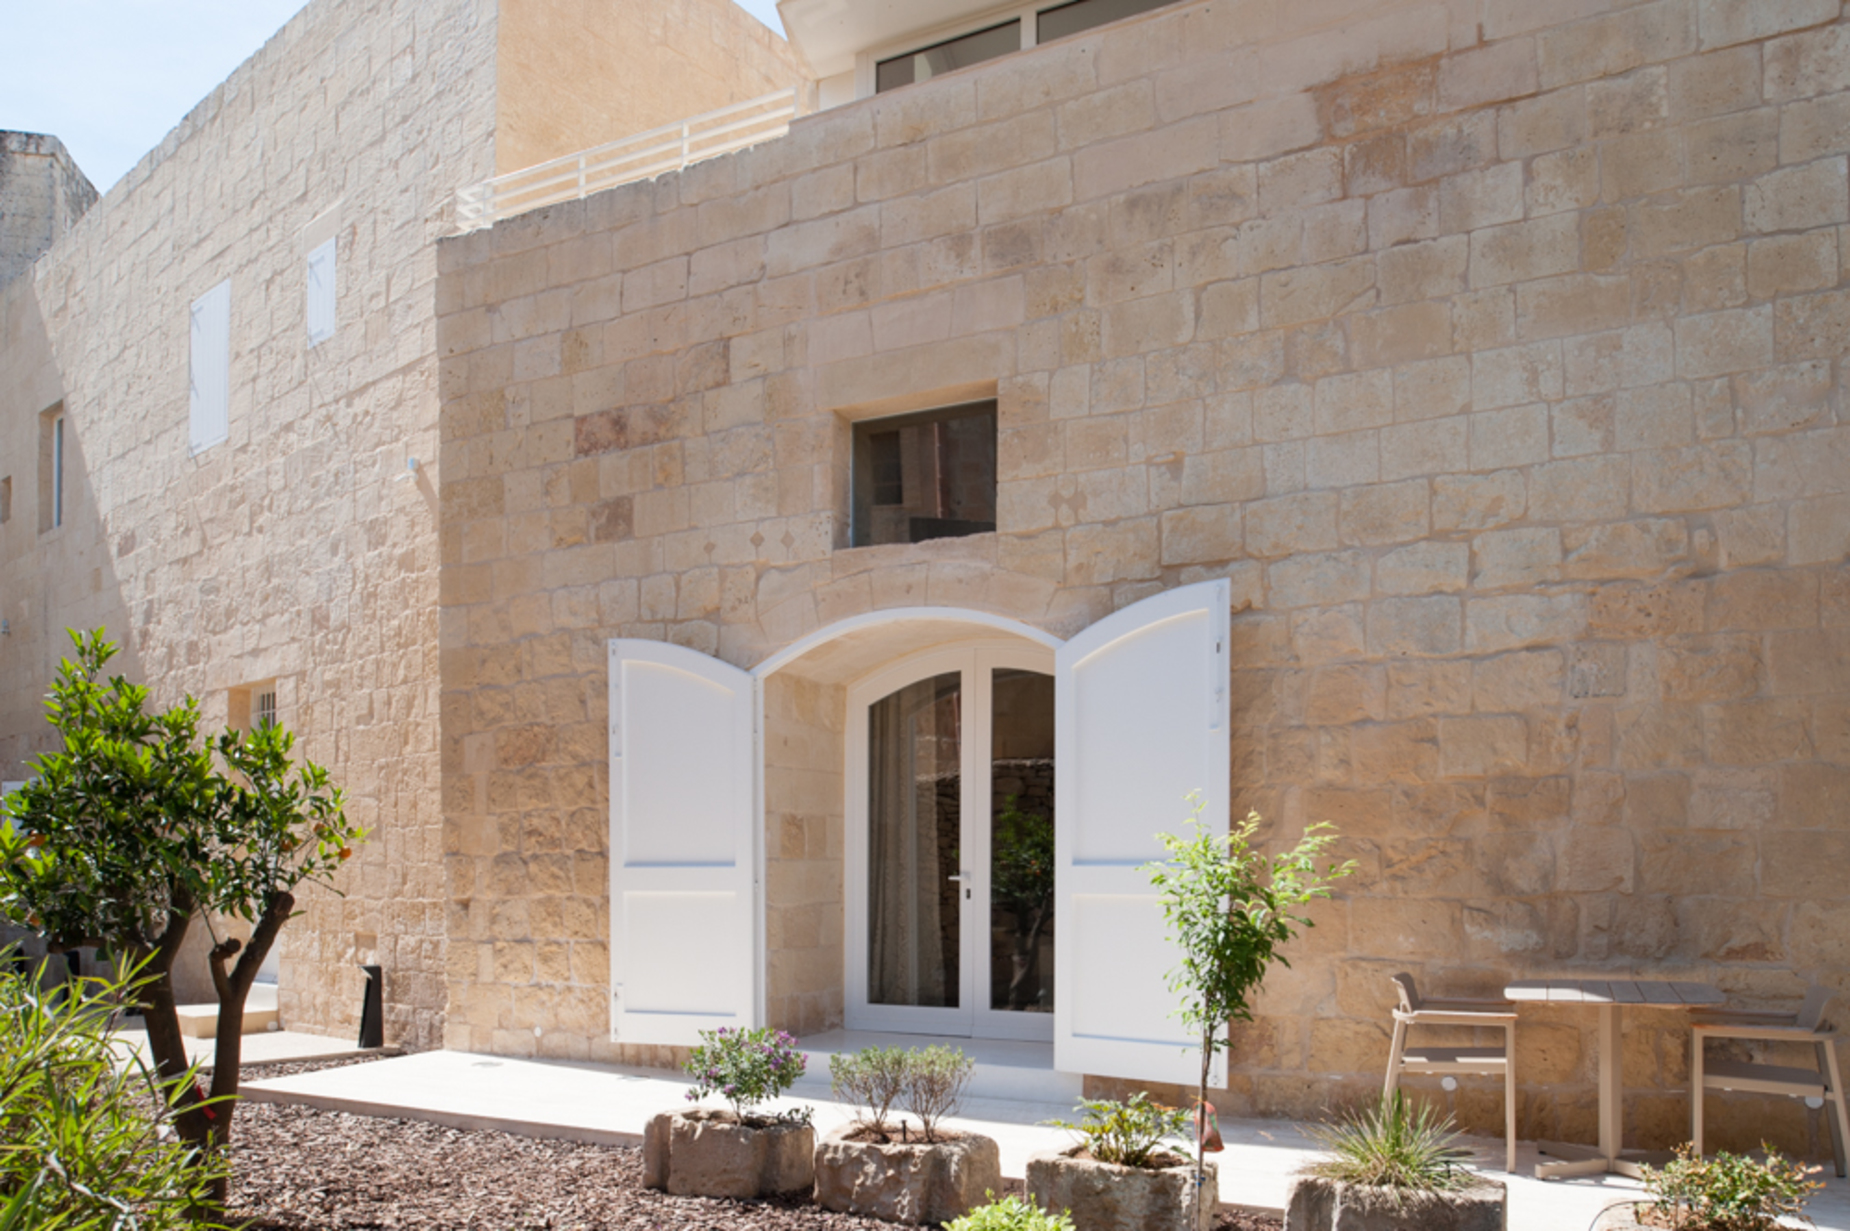 4 bed Town House For Sale in Balzan, Balzan - thumb 11